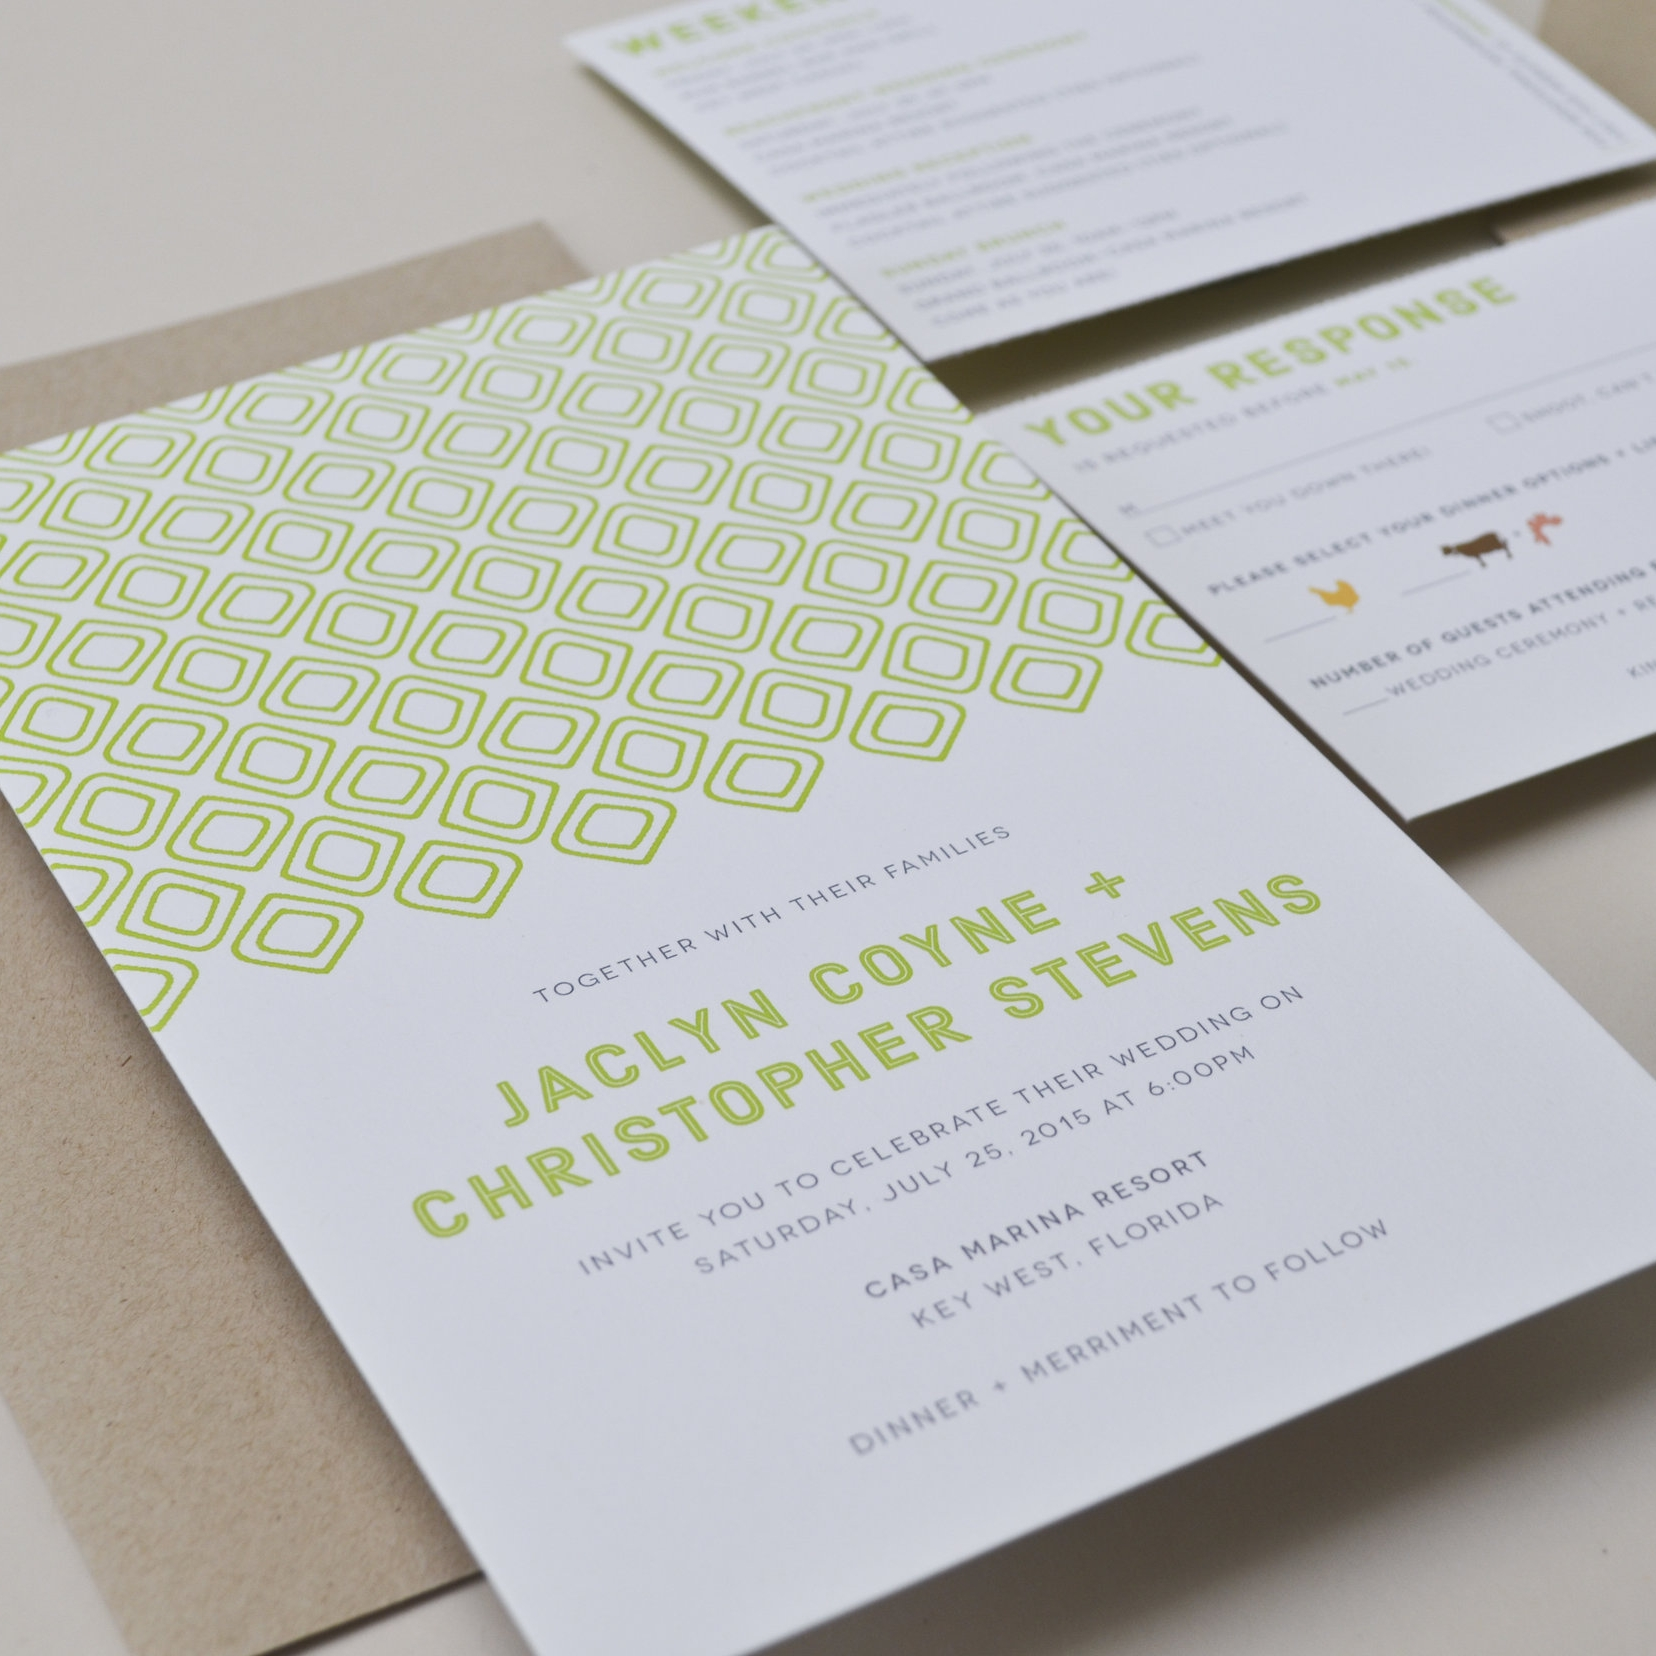 ISLAMORADA Digital Printing on White Paper